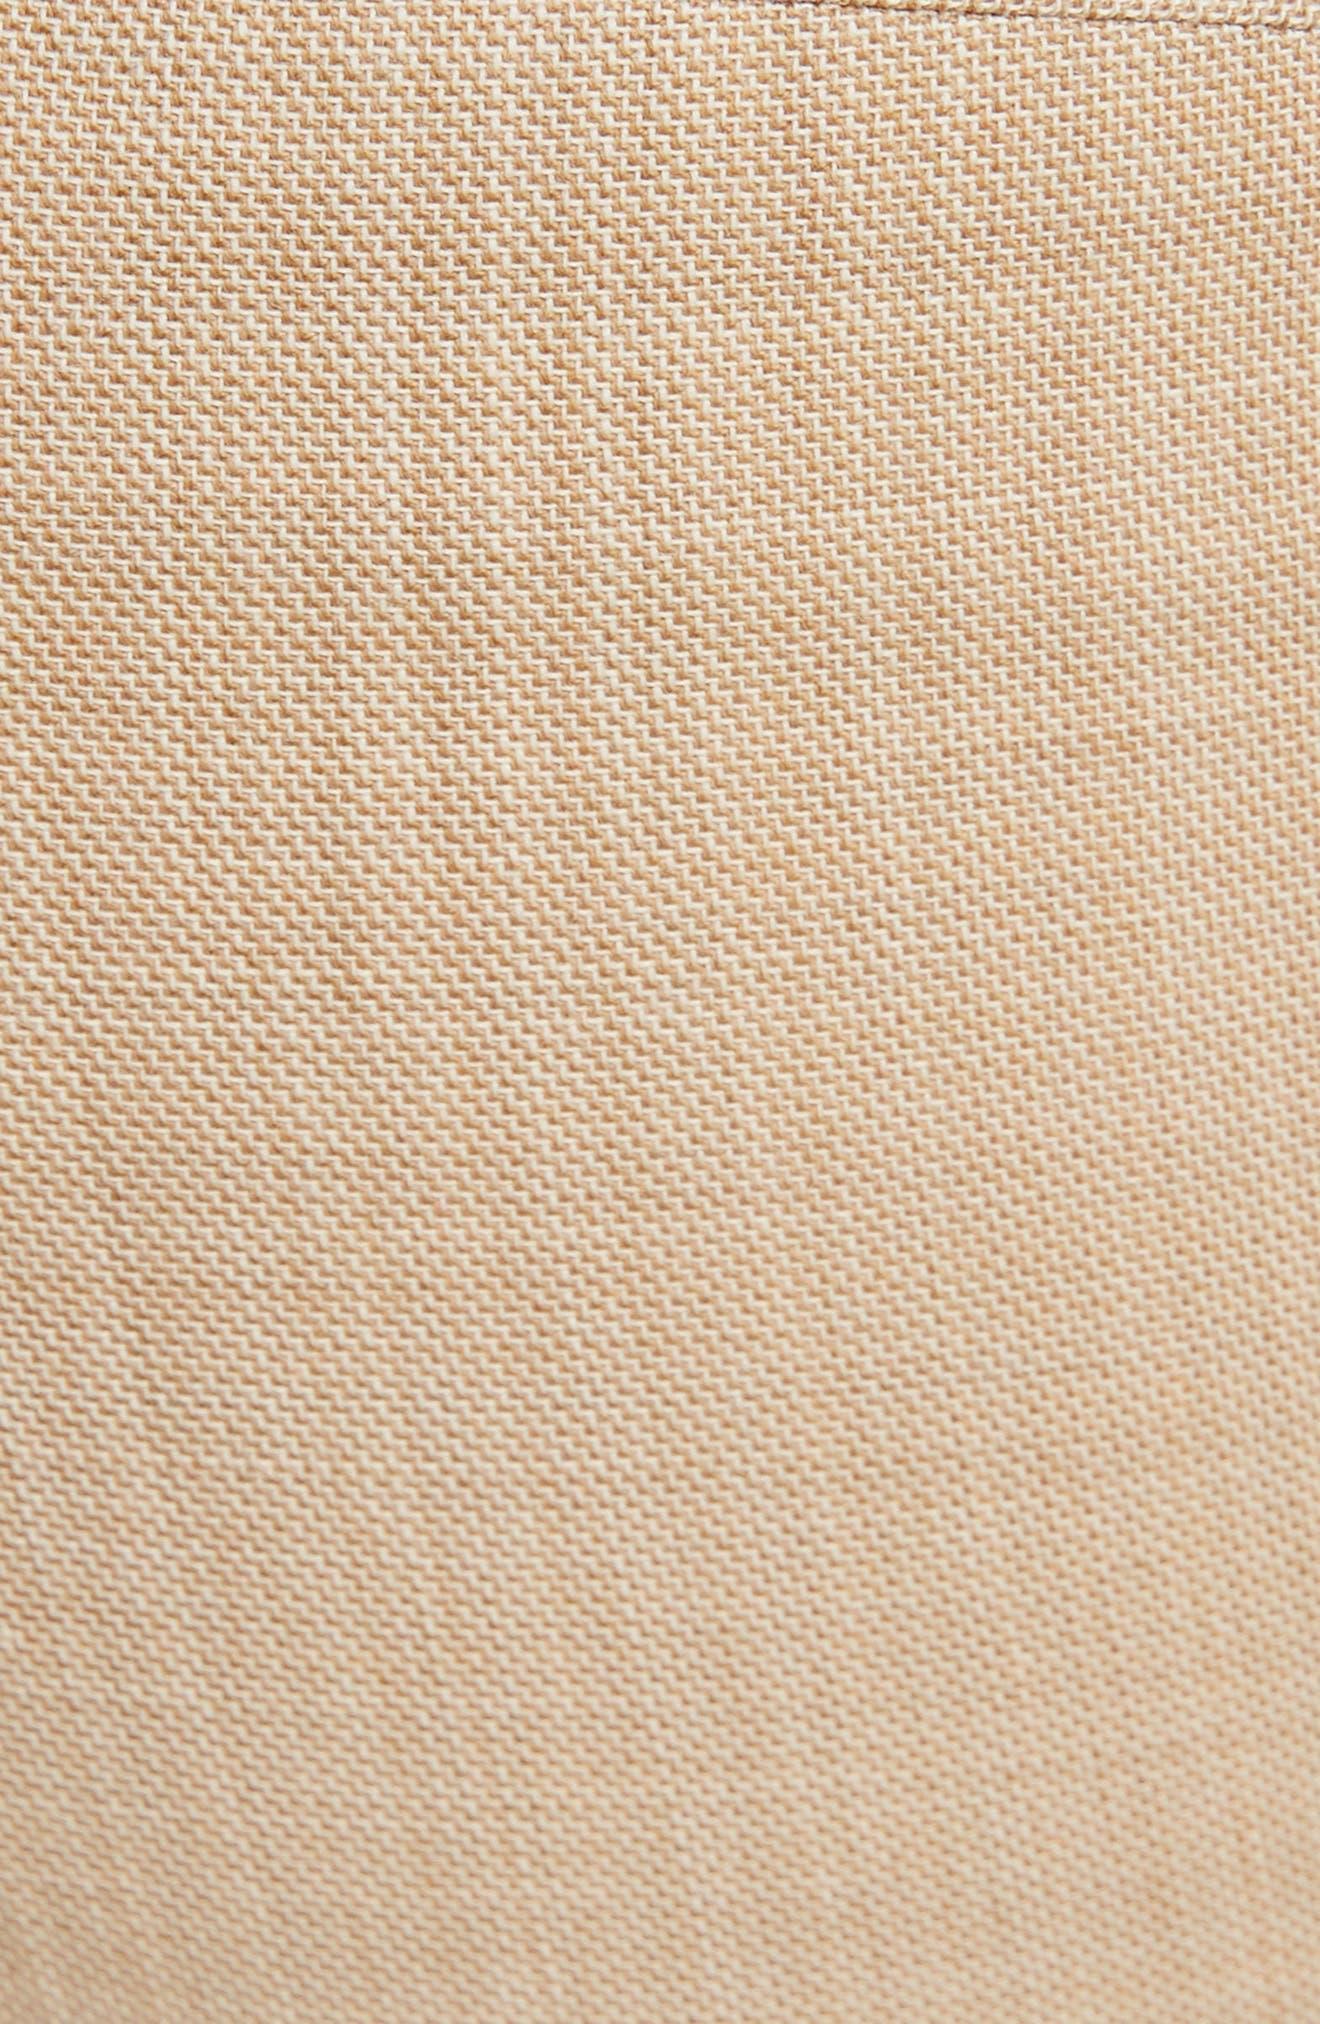 VICTORIA BECKHAM, High Waist Flare Wool Pants, Alternate thumbnail 5, color, LIGHT BEIGE-WHITE